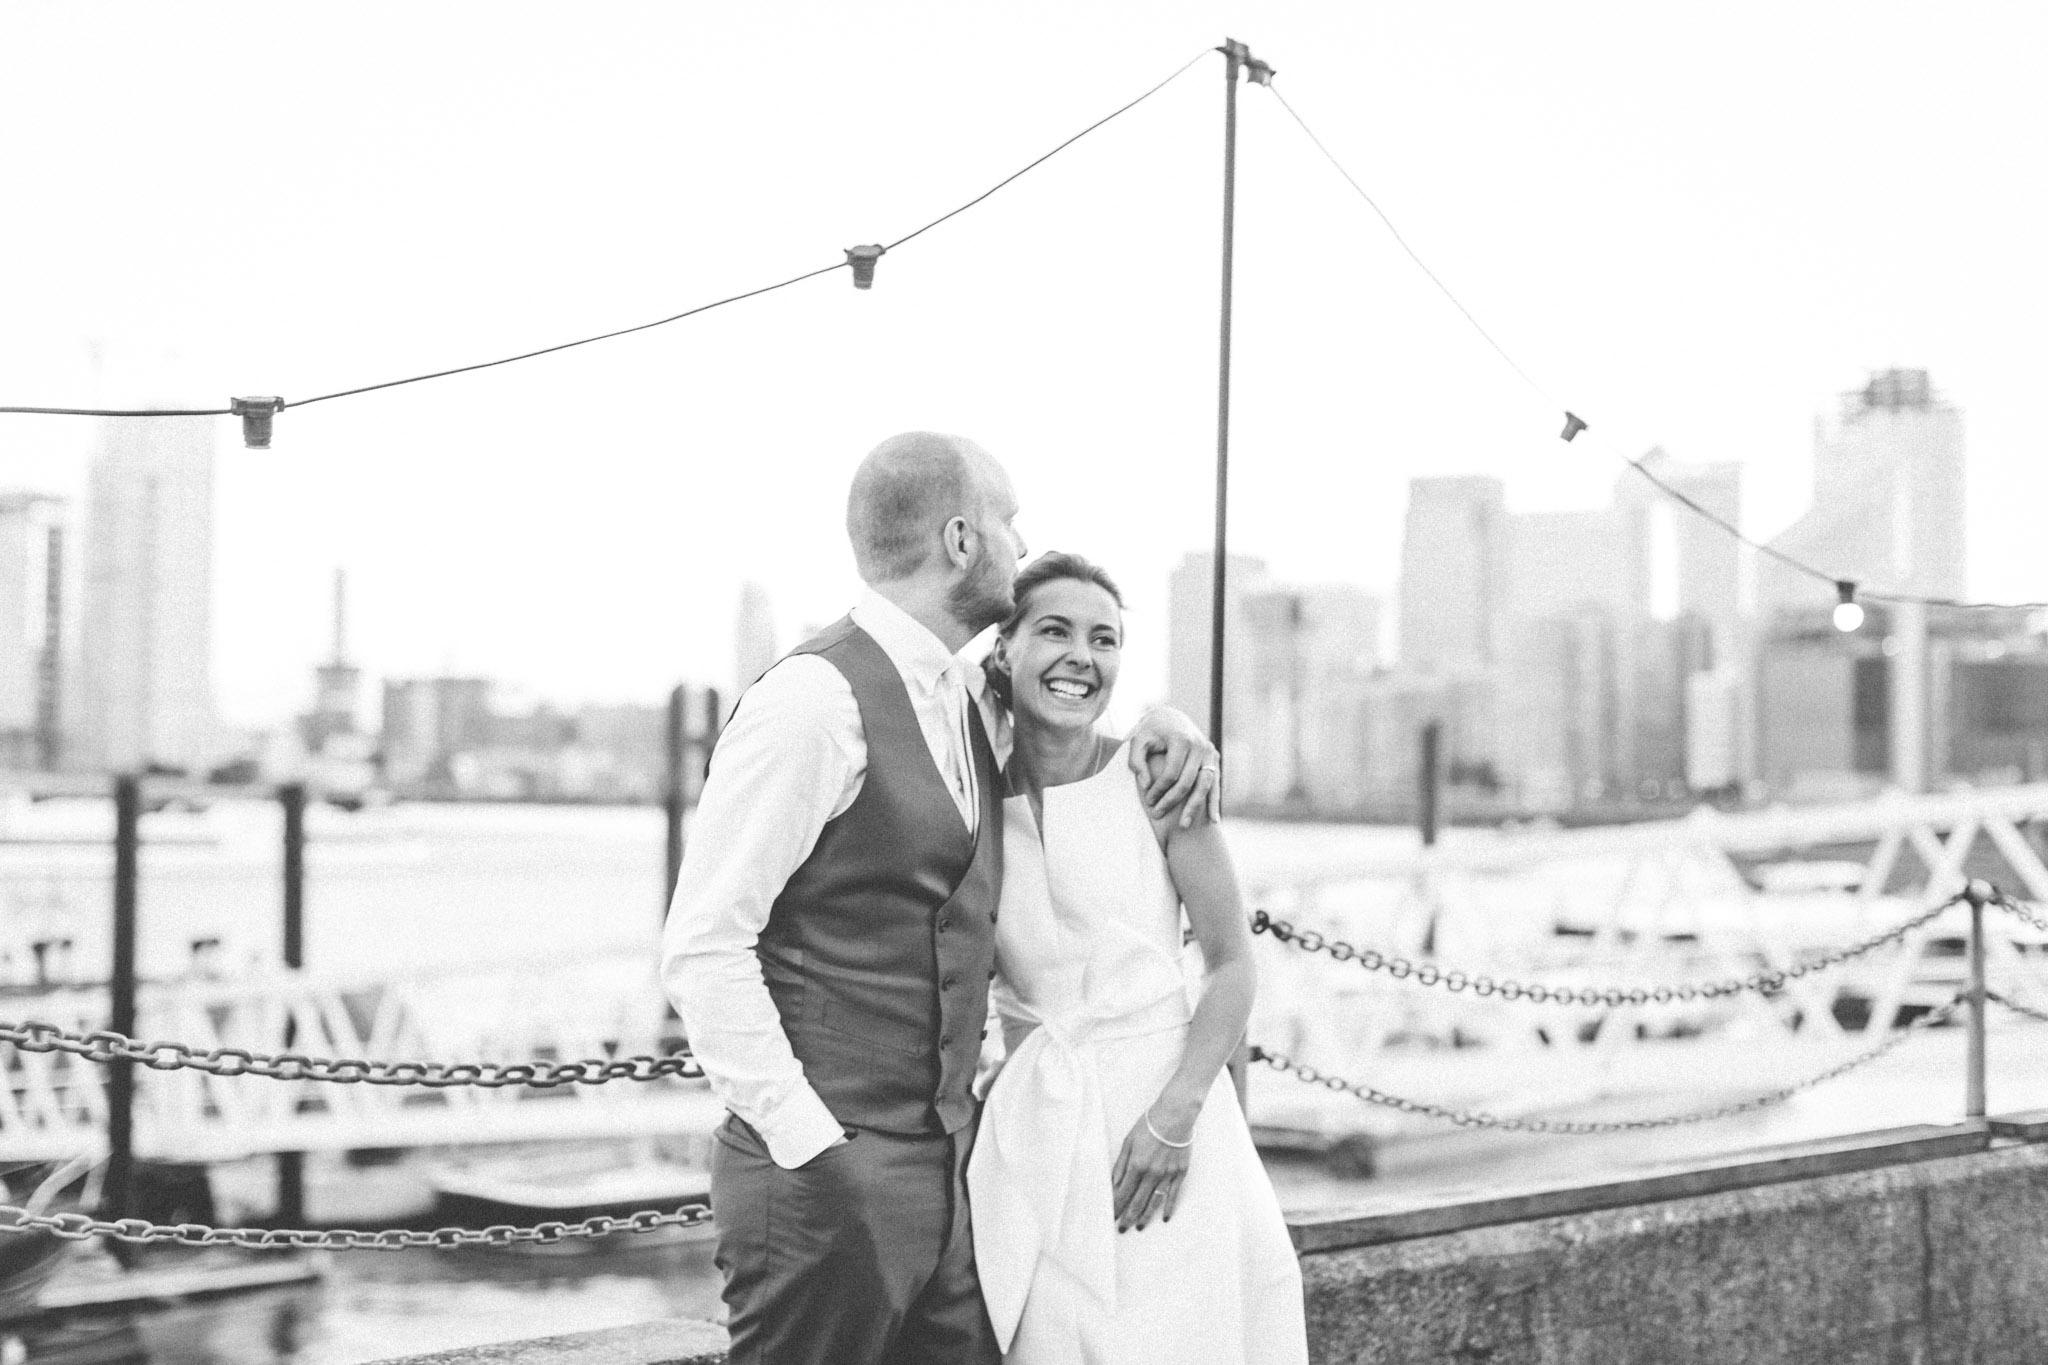 trinity_buoy_wharf_hackney_town_hall_wedding_426.jpg